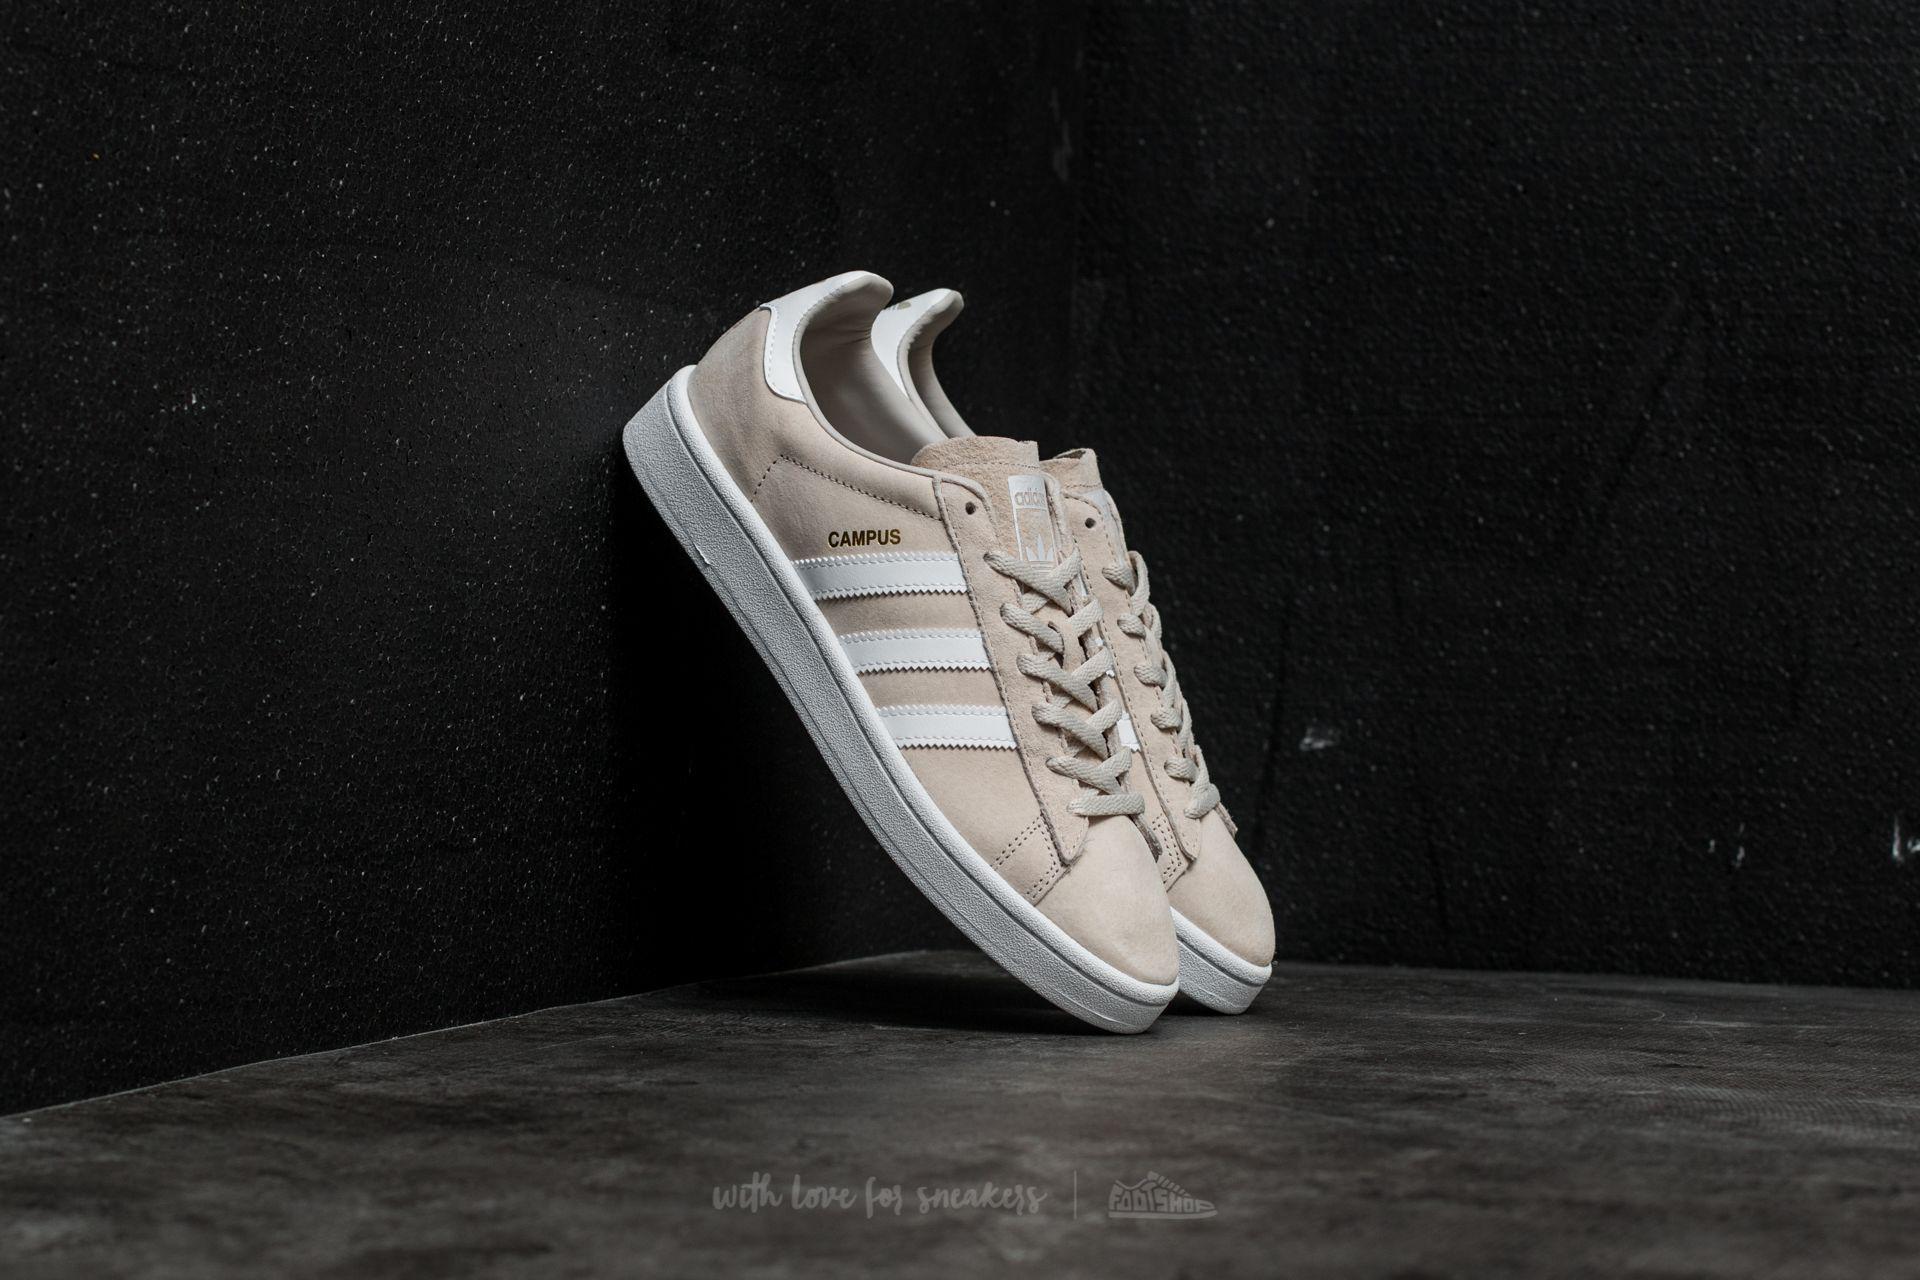 9a6830acde adidas Originals Adidas Campus W Clear Brown  Footwear White ...